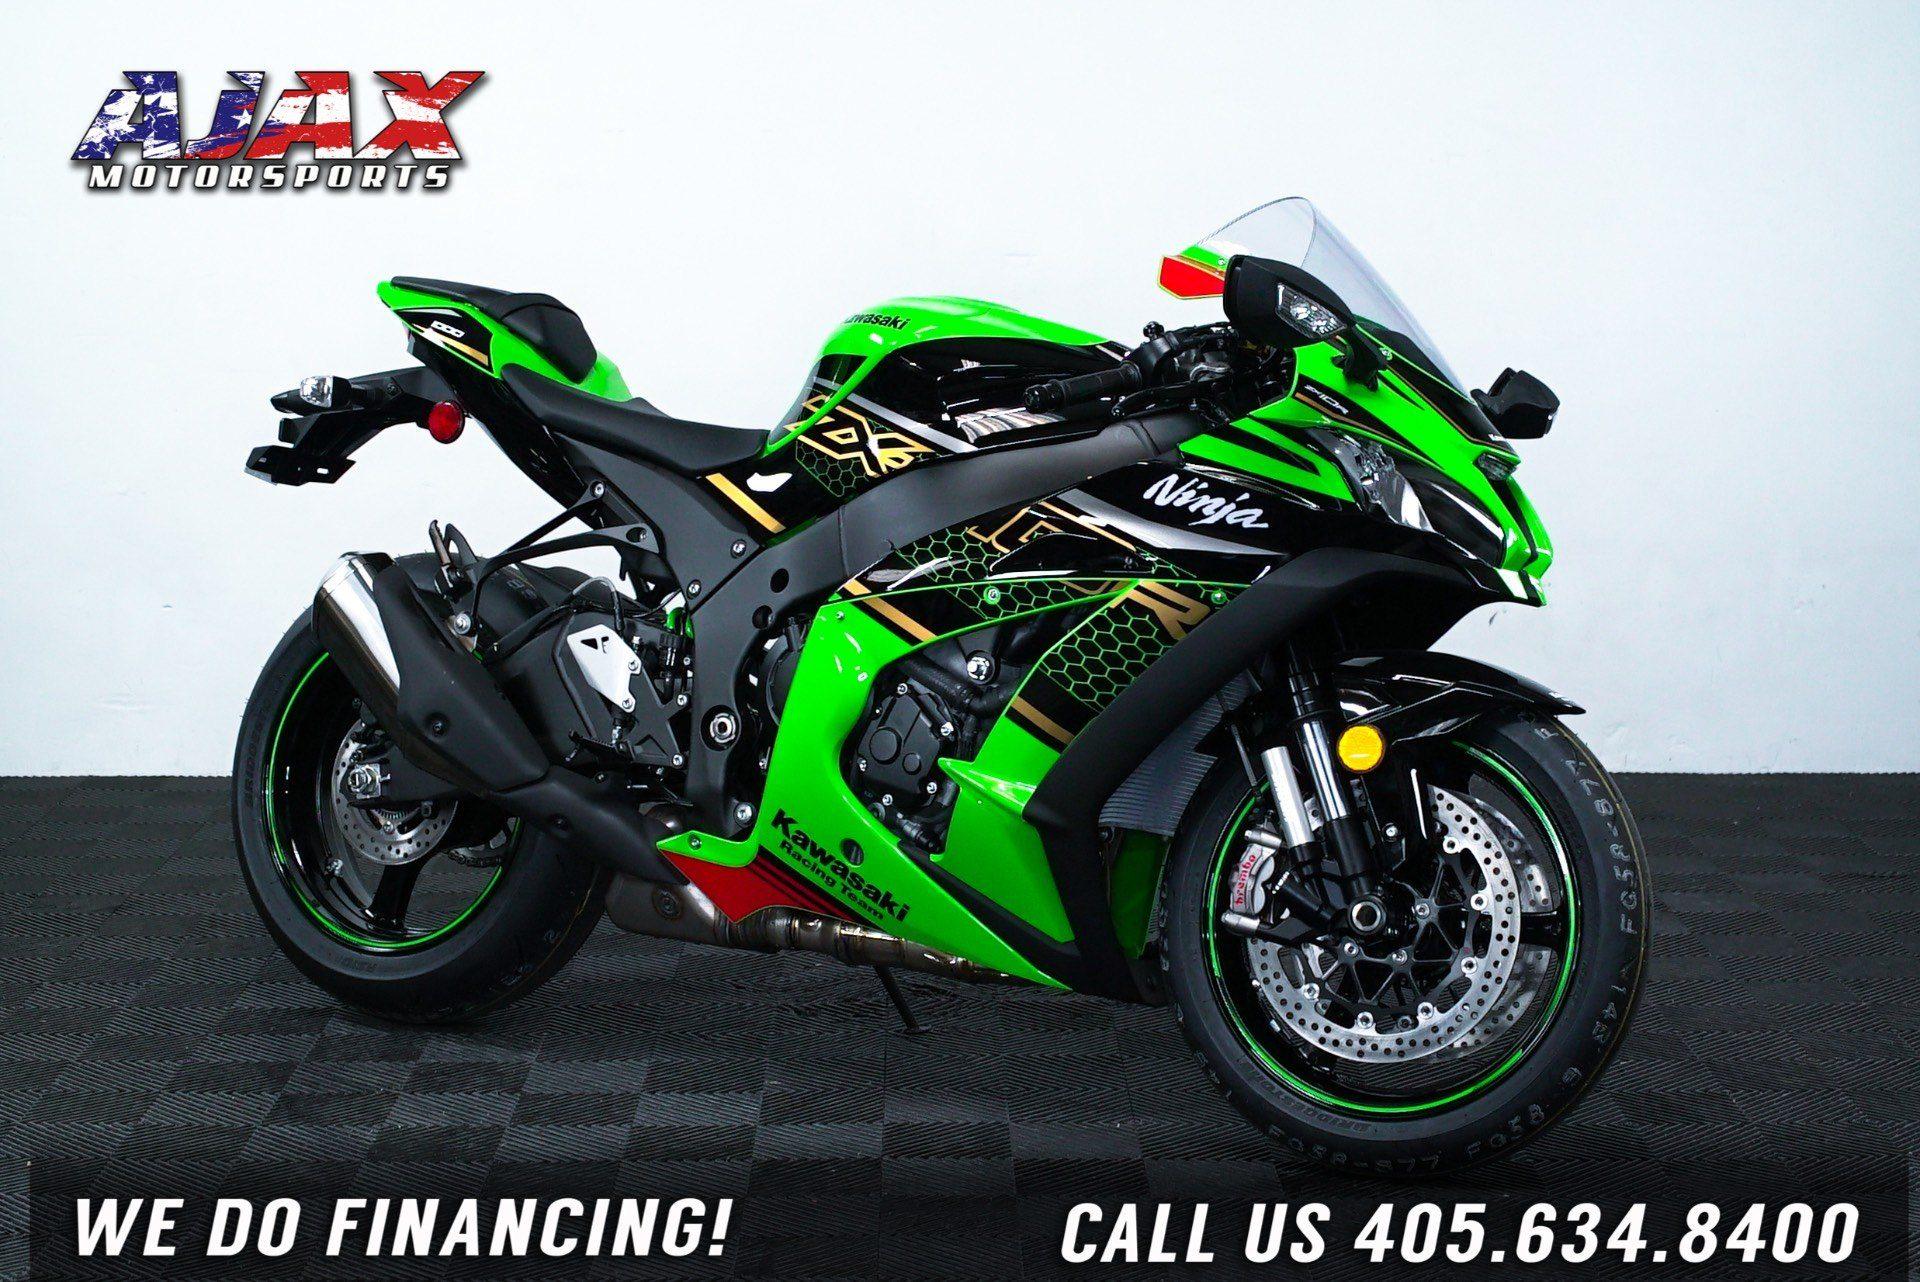 Motorbike 1 Design Photo Picture Frame 6 x 4 Landscape or Portrait Motorsports